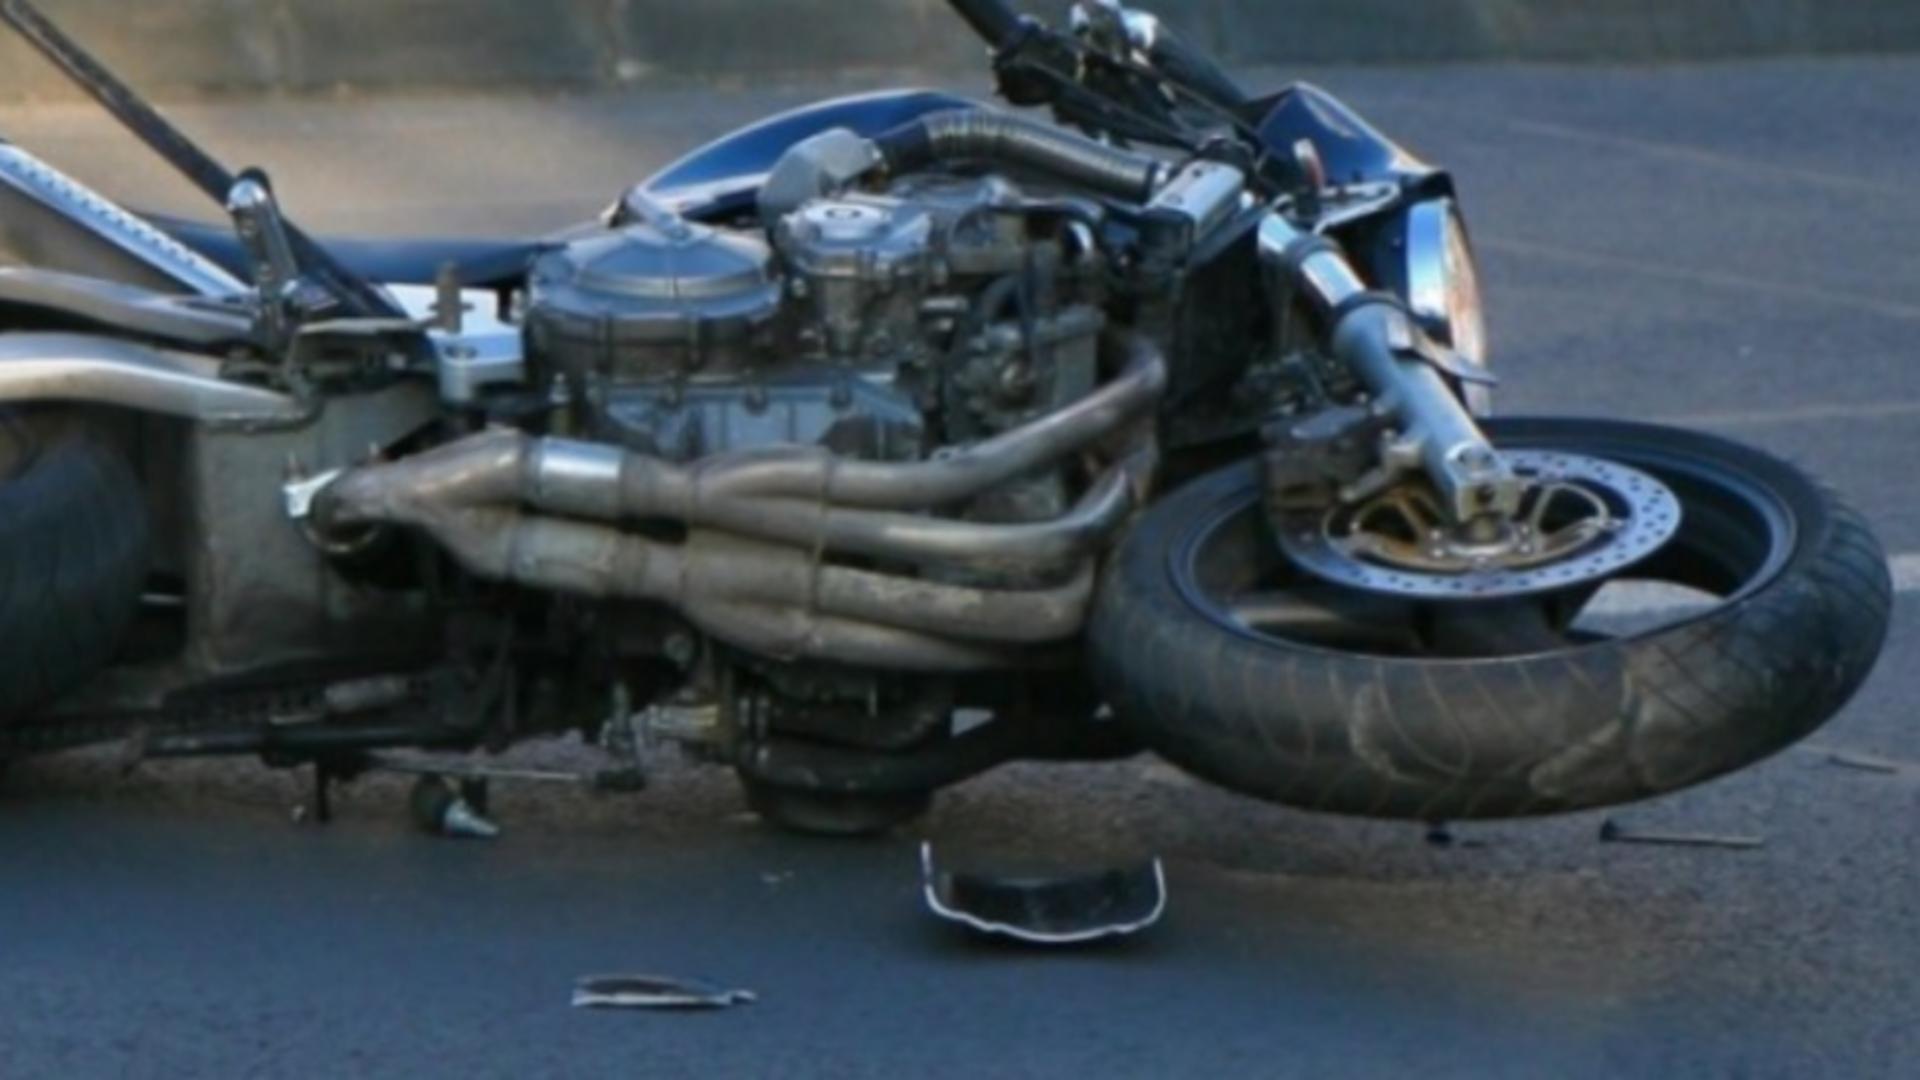 Motocicleta in accident